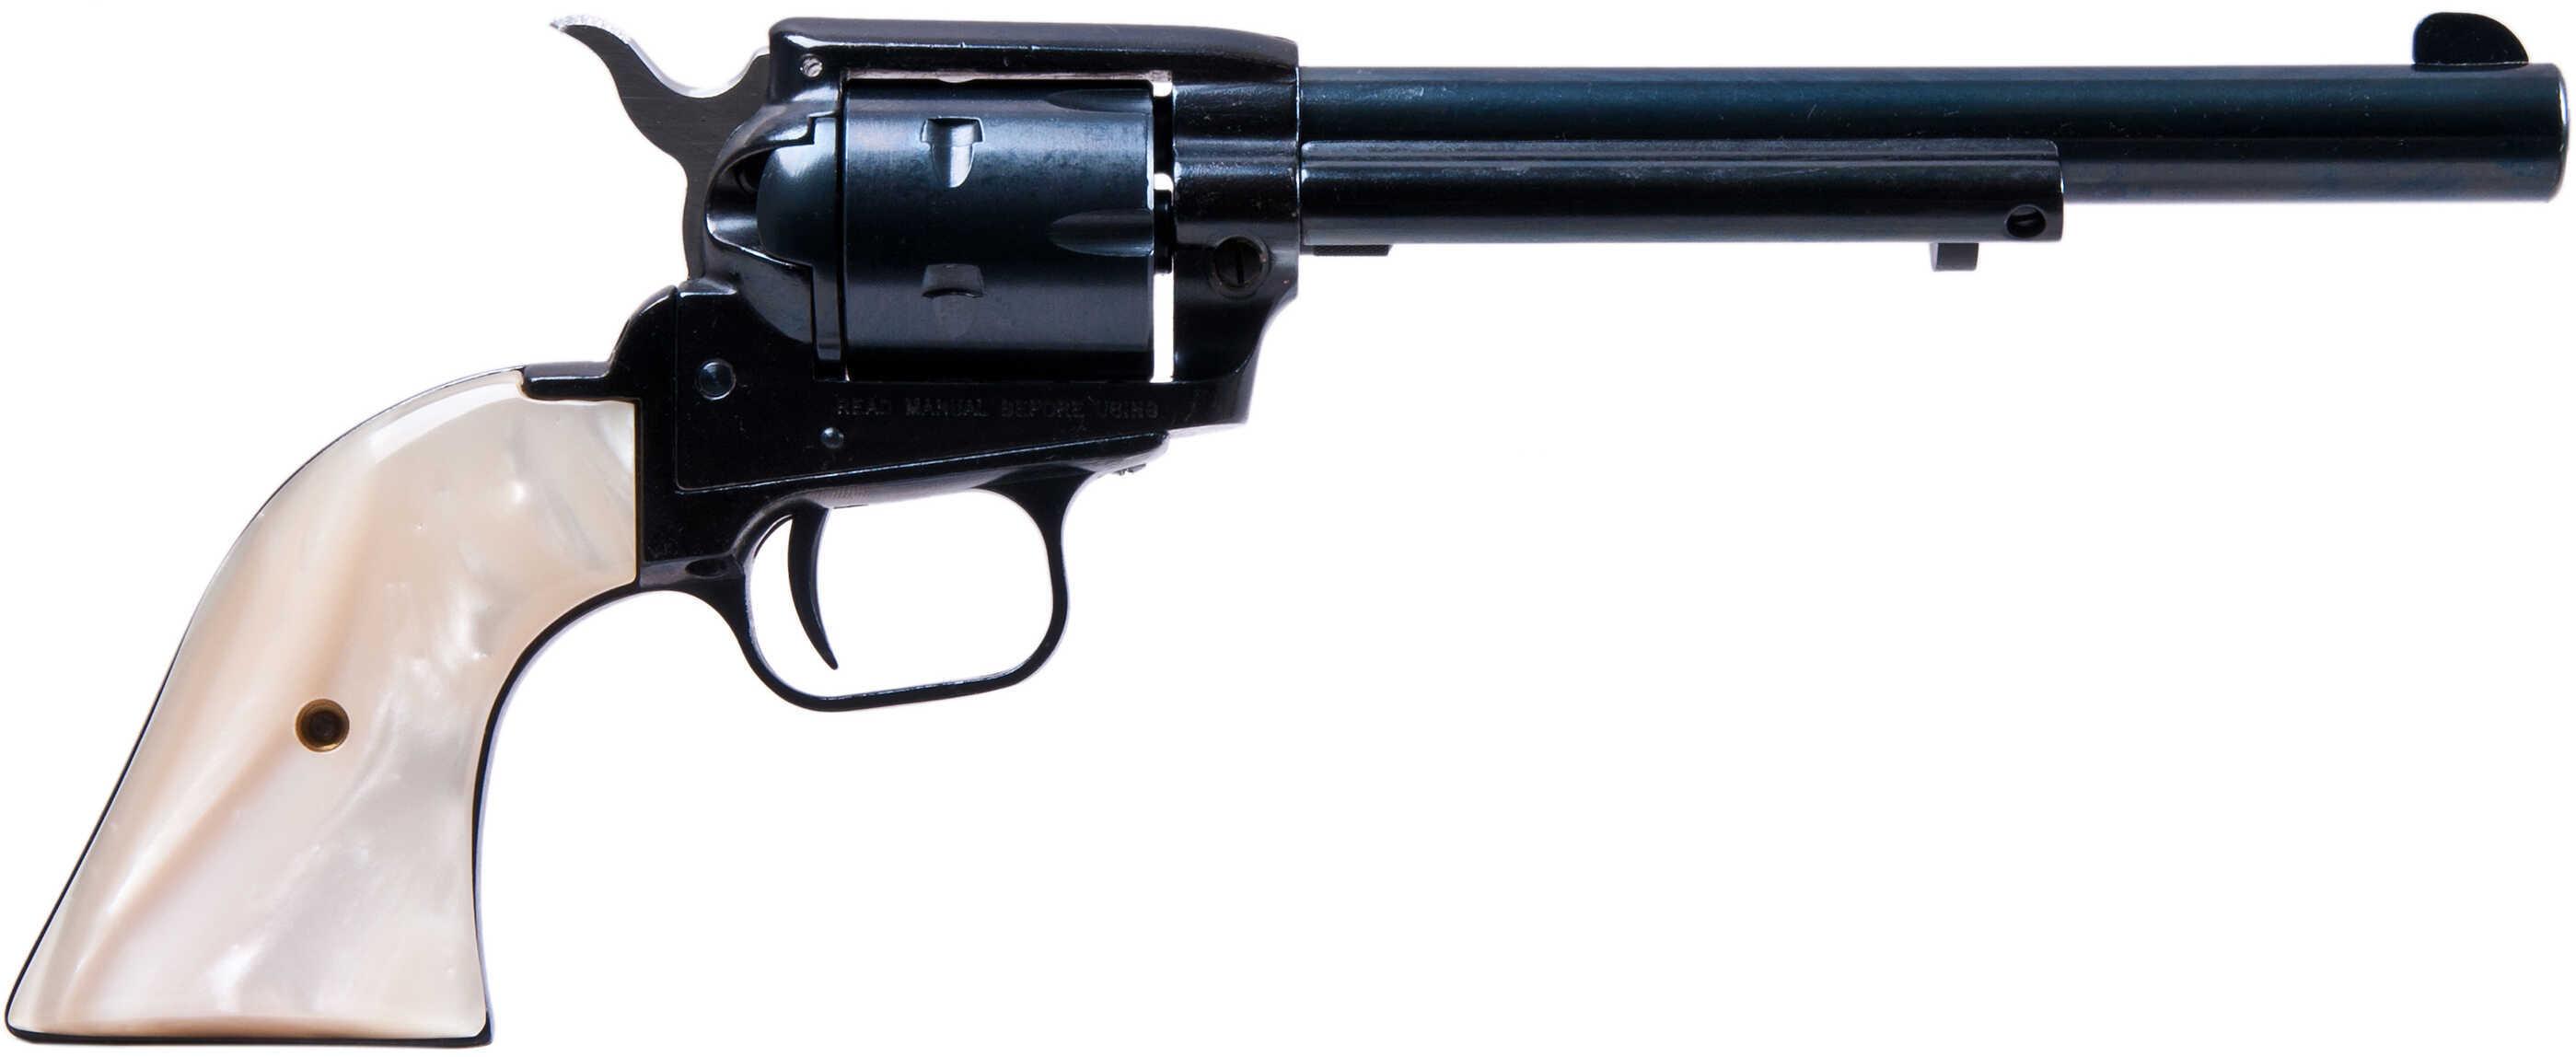 "Heritage Rough Rider Revolver SAA 22 Long Rifle/ 22 Mag 6.5"" Barrel Pearl Grip RR22MB6PRL"